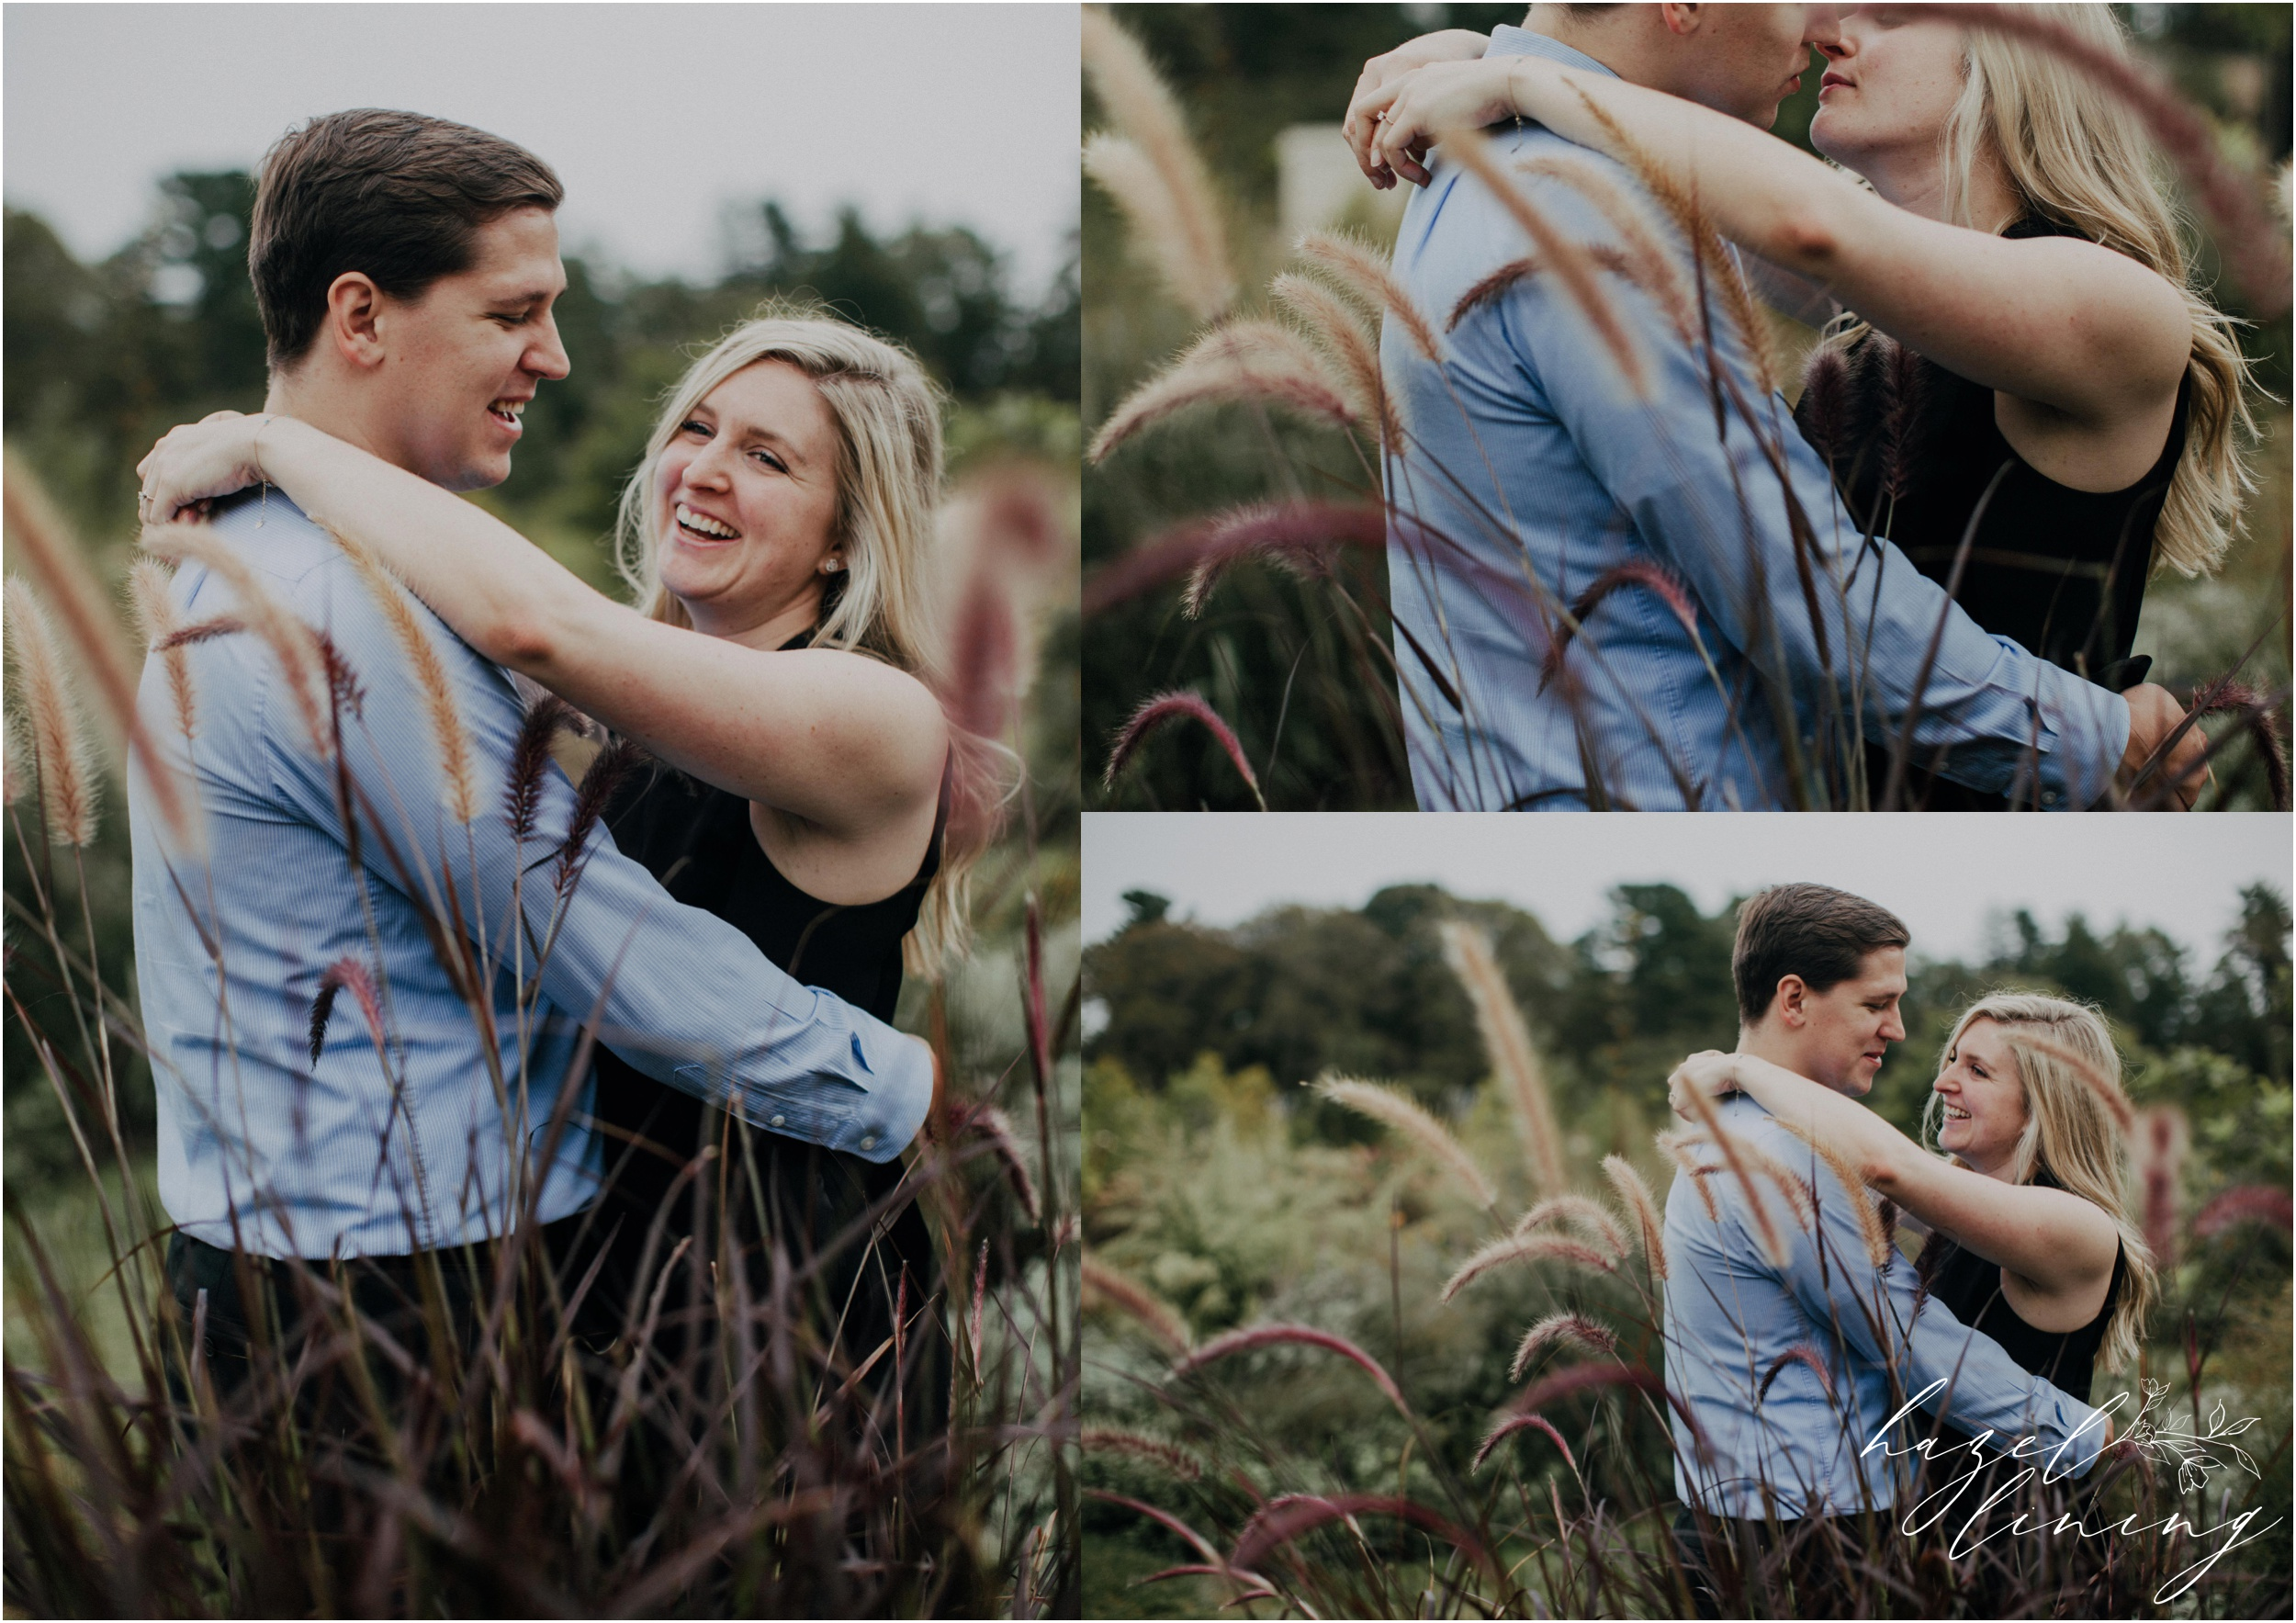 victoria-travis-logan-mayes-longwood-gardens-kennett-square-philadelphia-engagement-session-hazel-lining-photography-destination-elopement-wedding-engagement-photography_0029.jpg